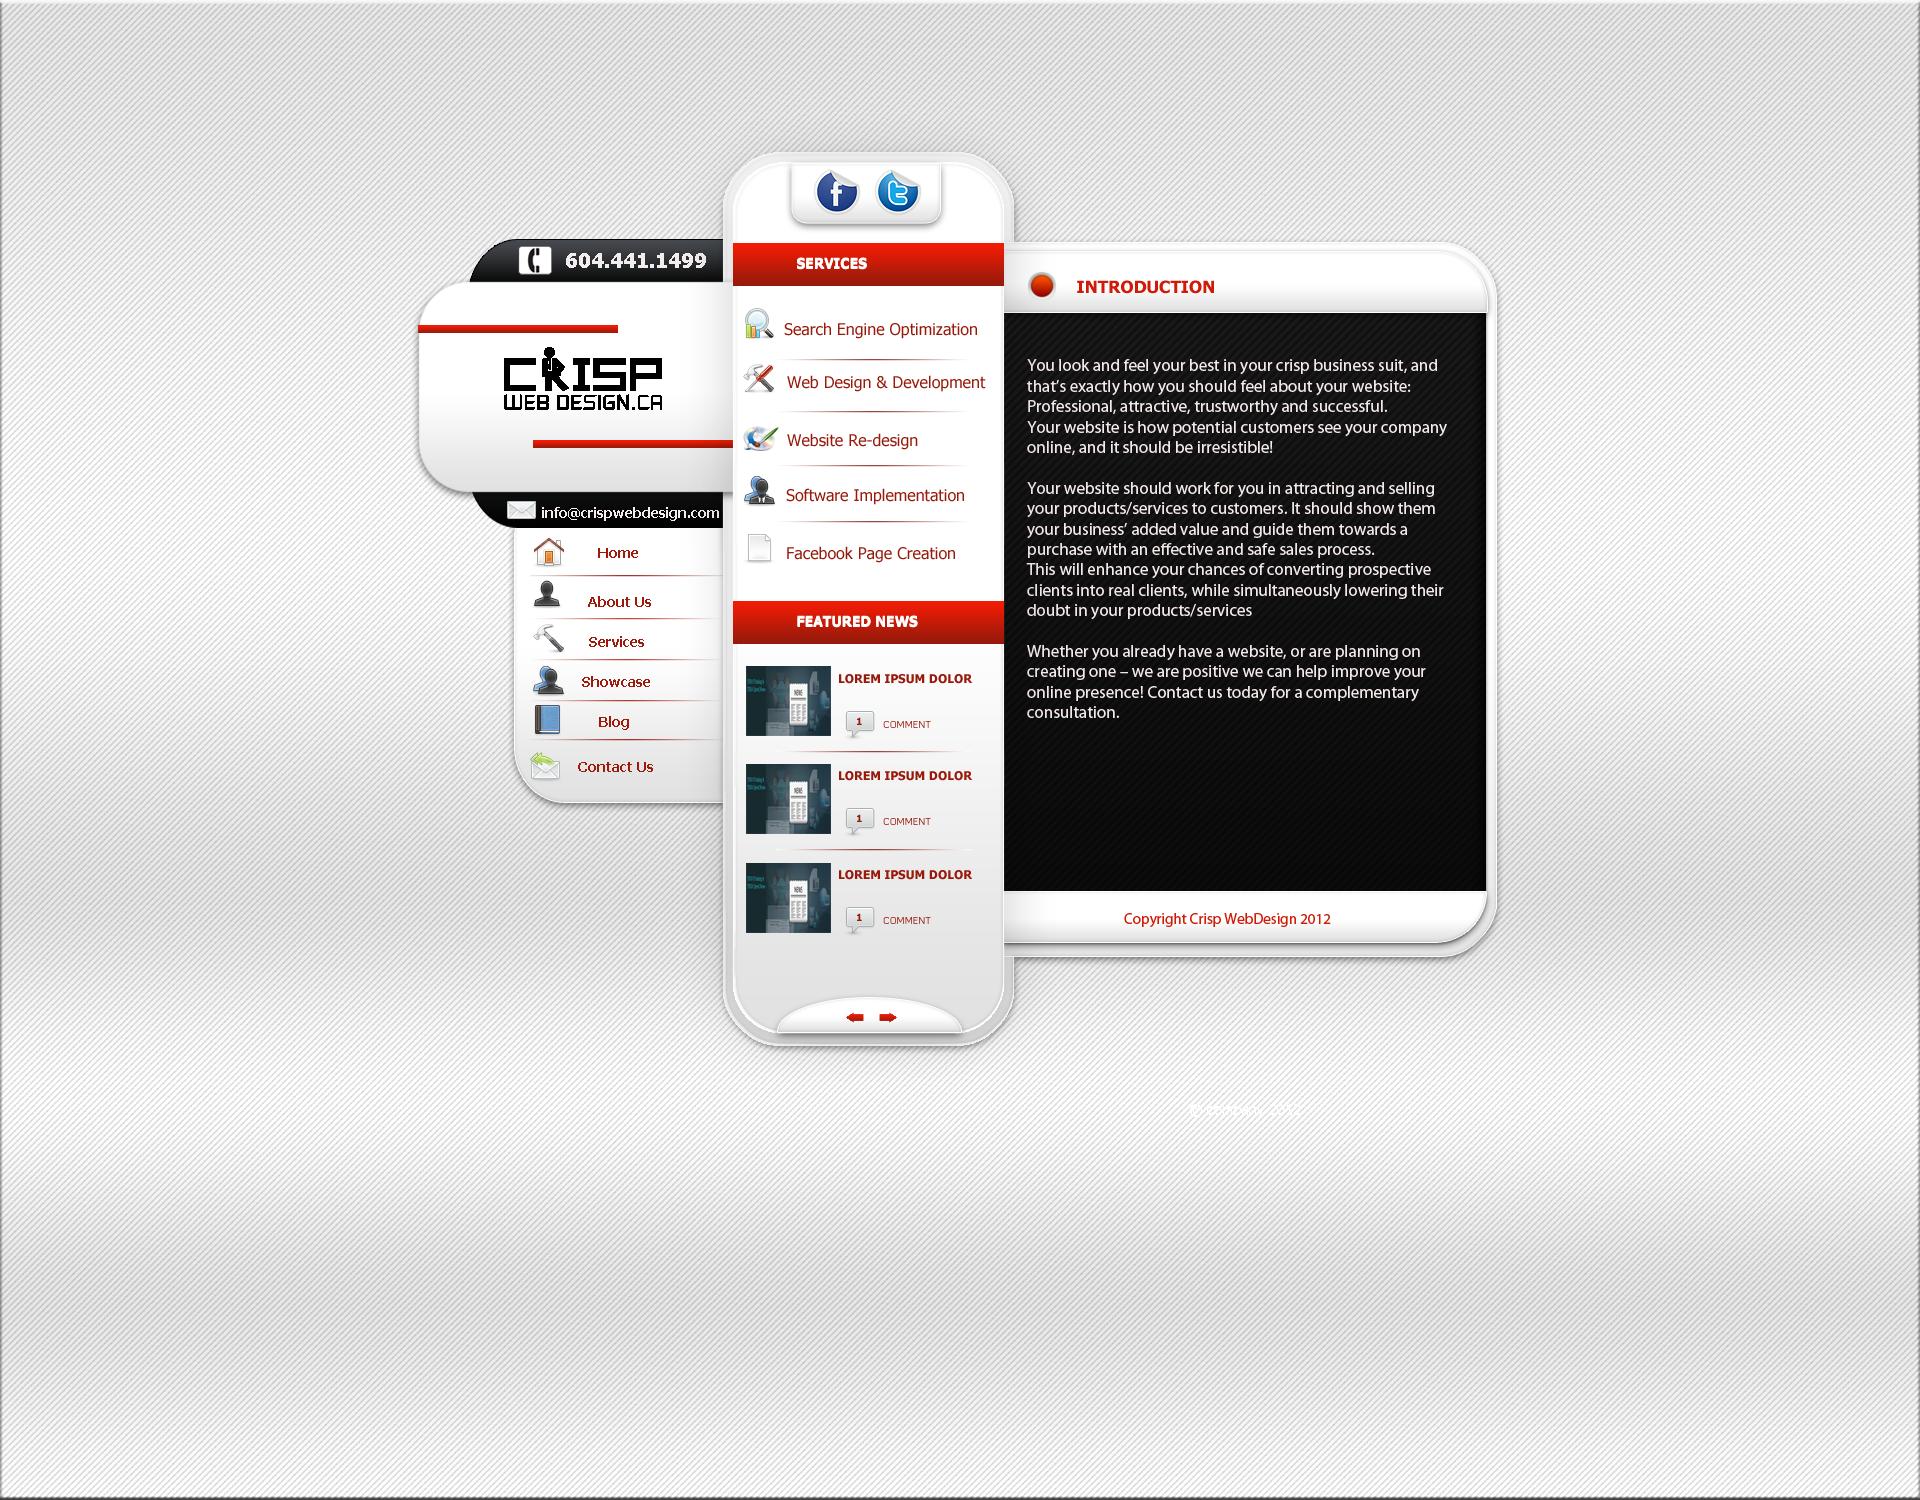 Full website design and coding